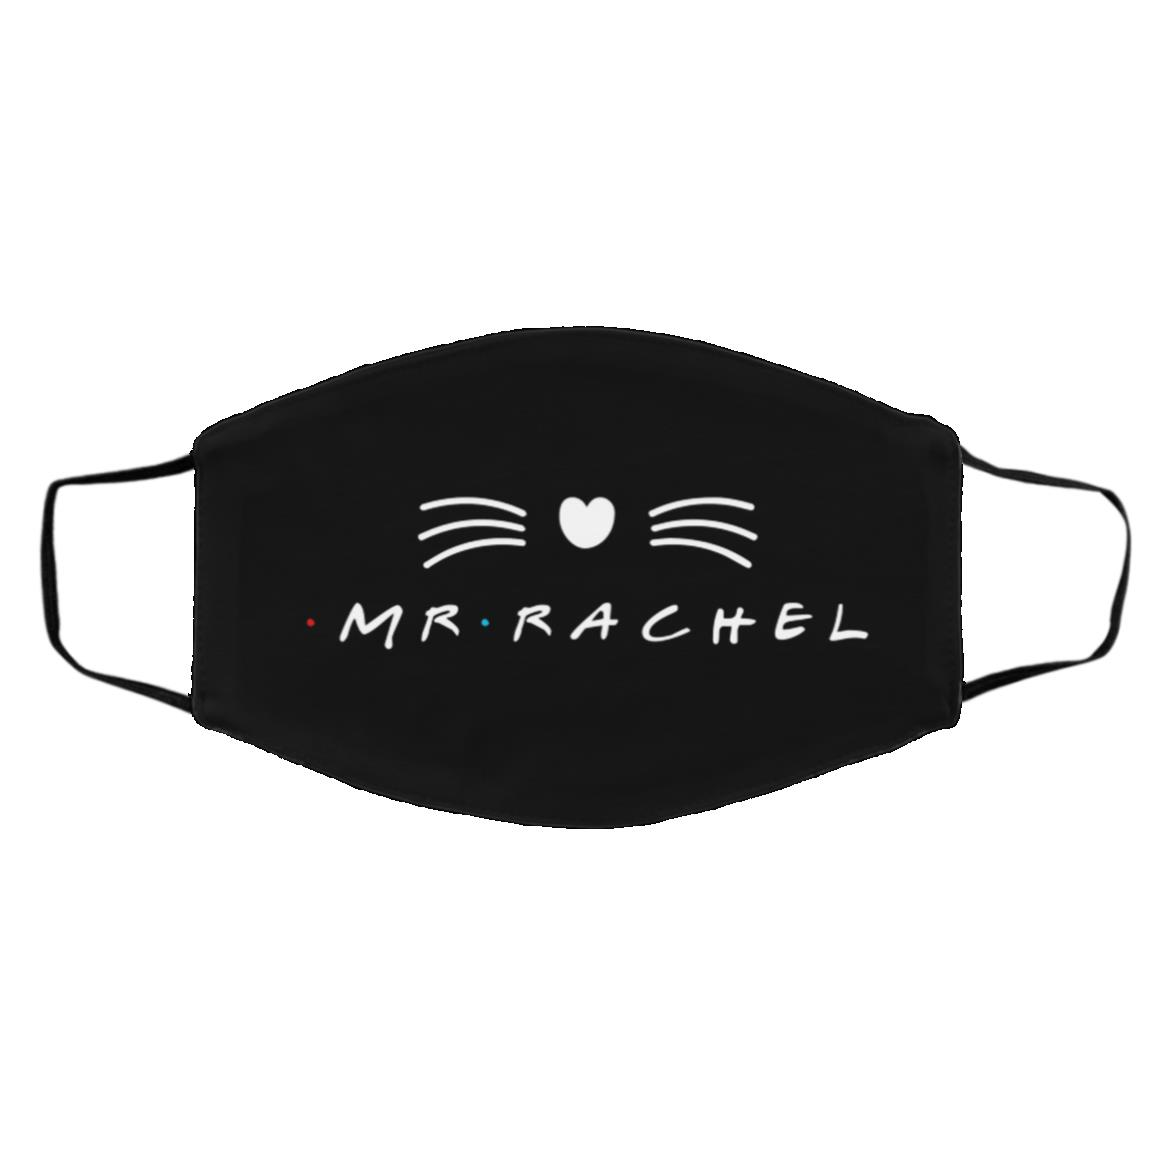 Mr Rachel Mrs Ross Couple Friends, Black, Cloth Face Cover – Medium/Large